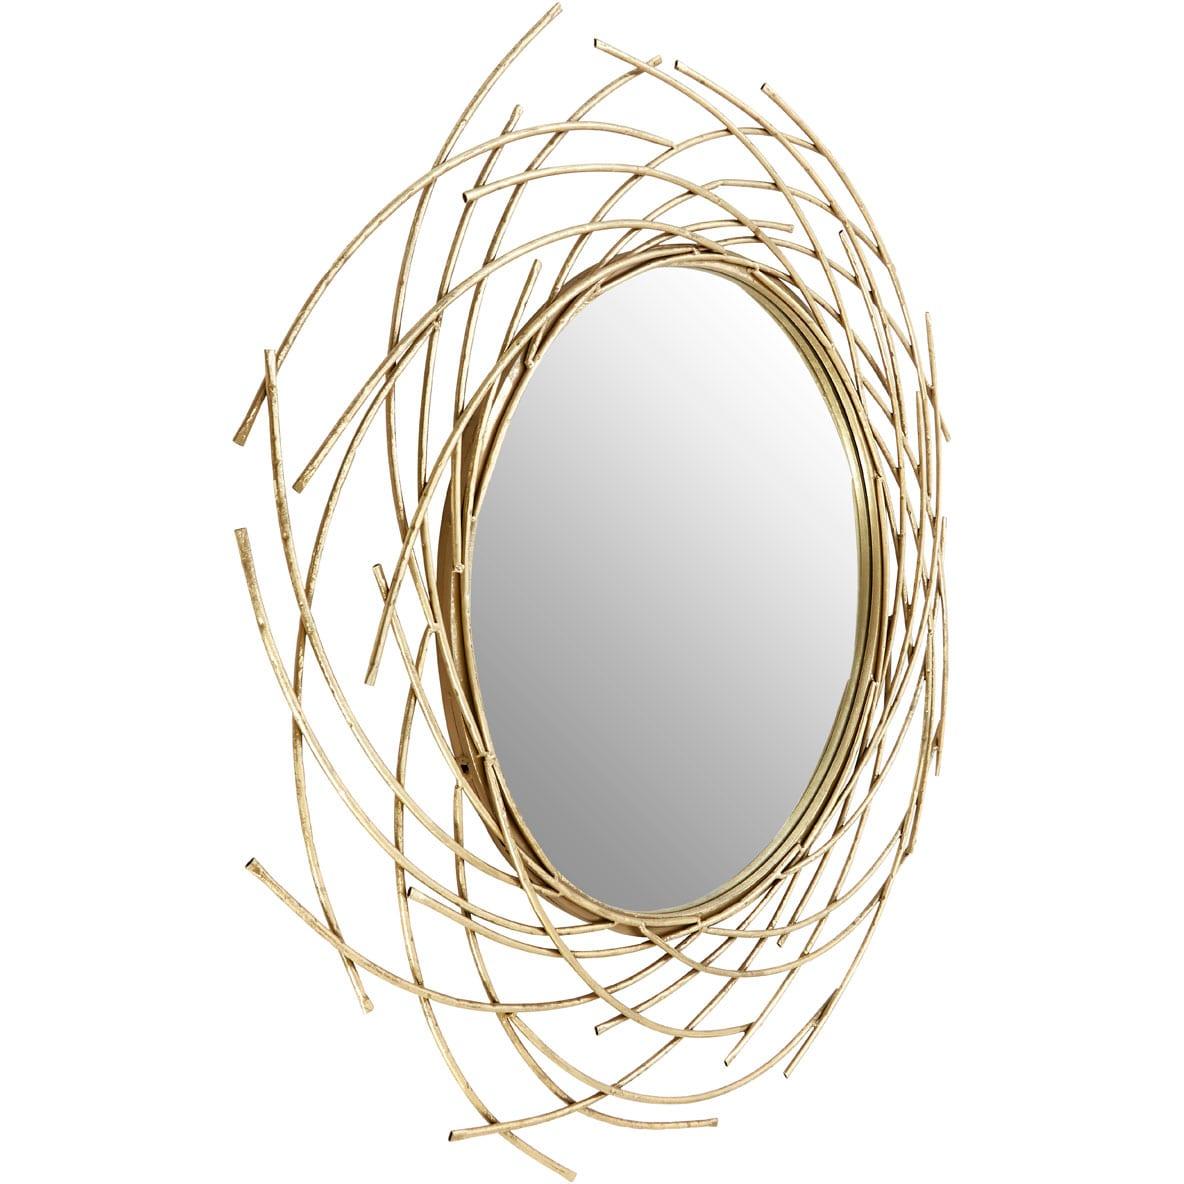 Toulon Spiral Wall Mirror